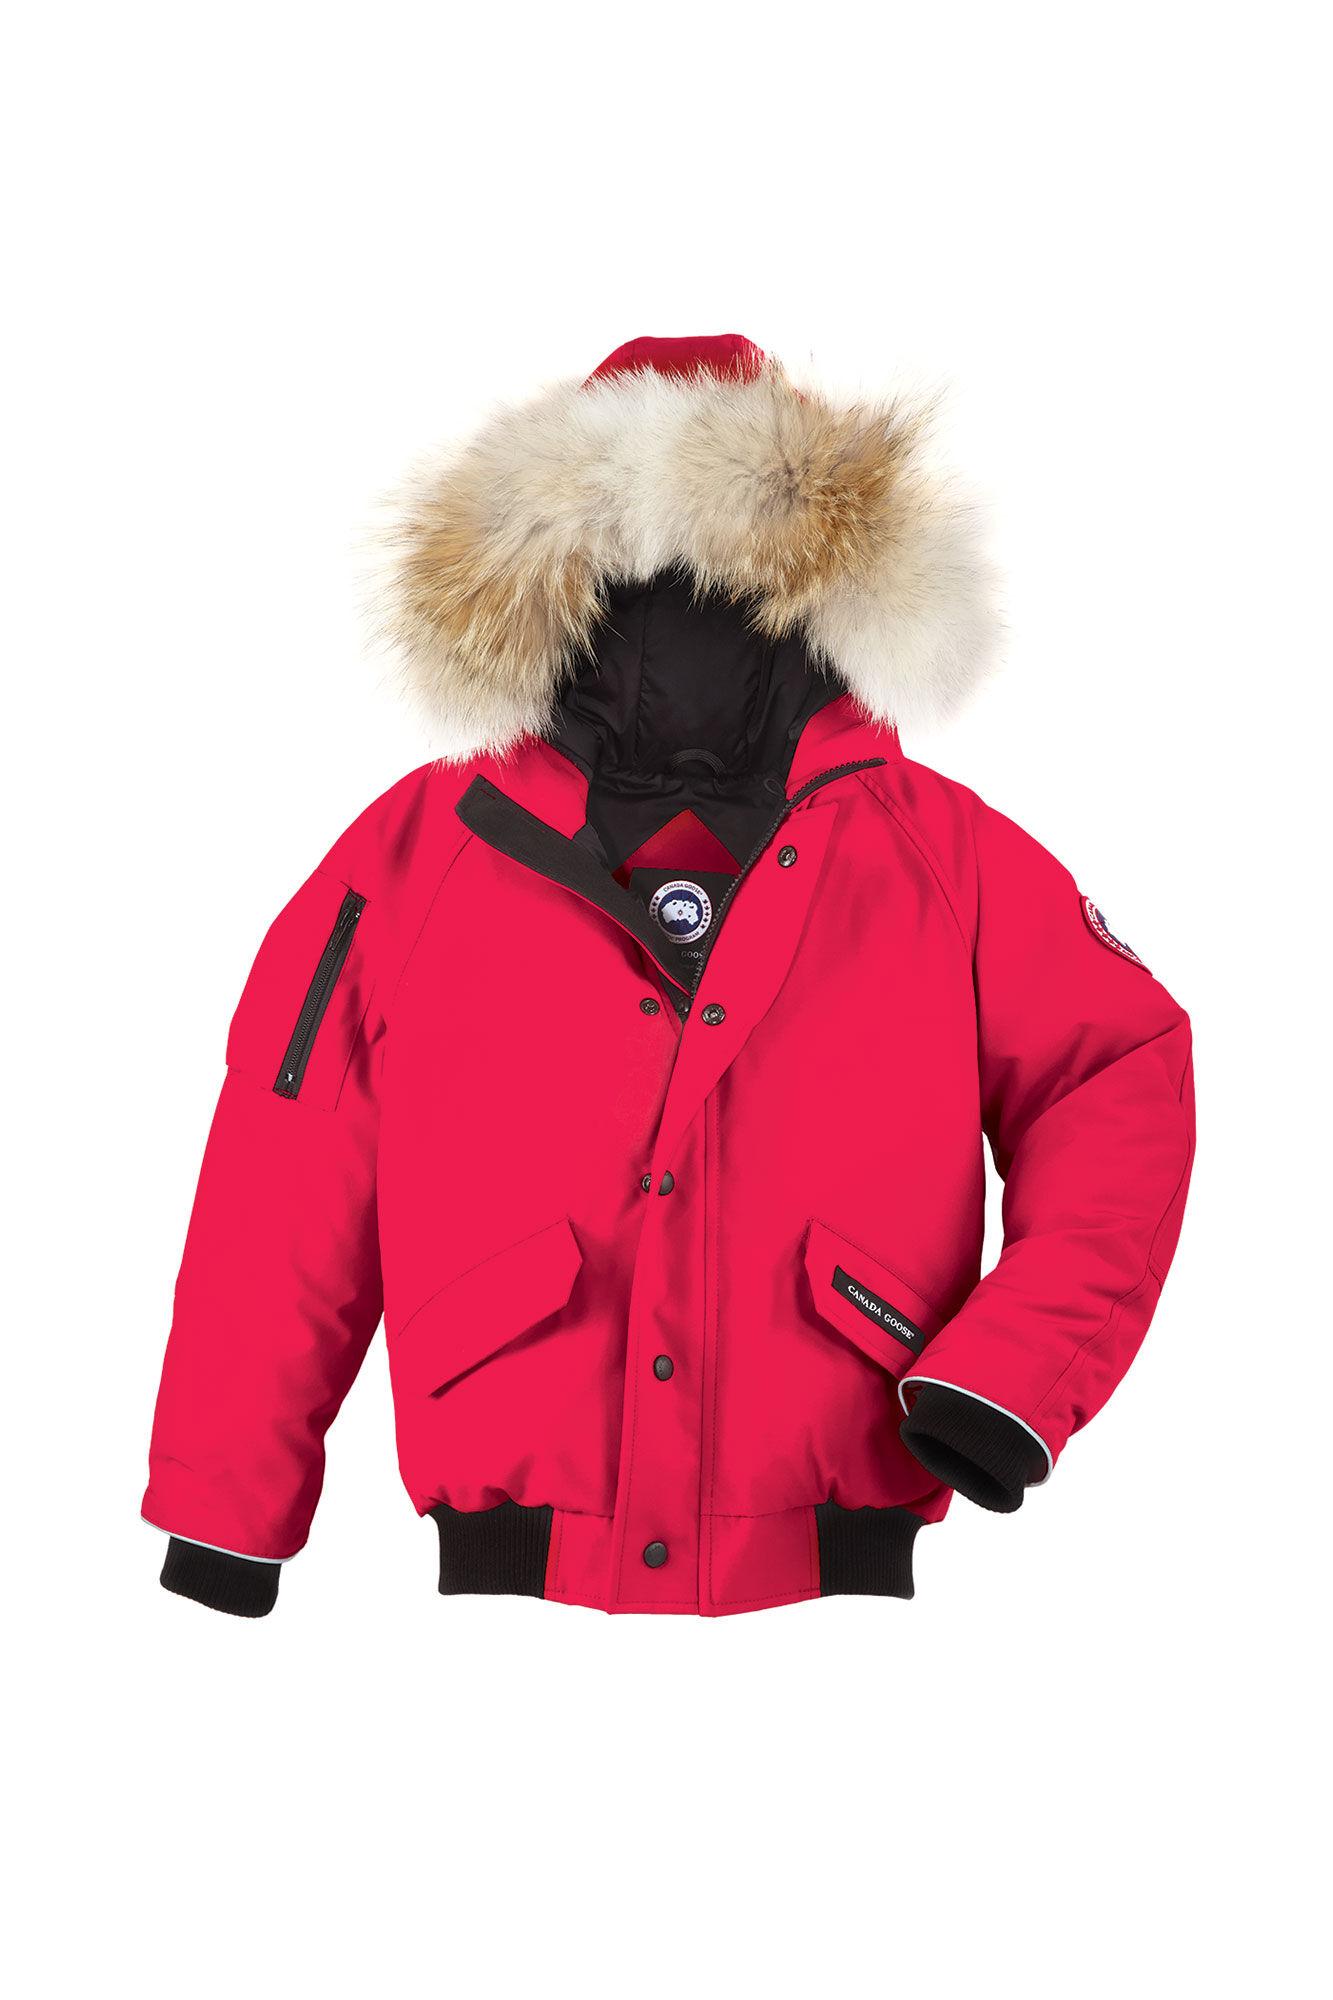 Canada Goose kids sale authentic - Rundle Bomber | Canada Goose?